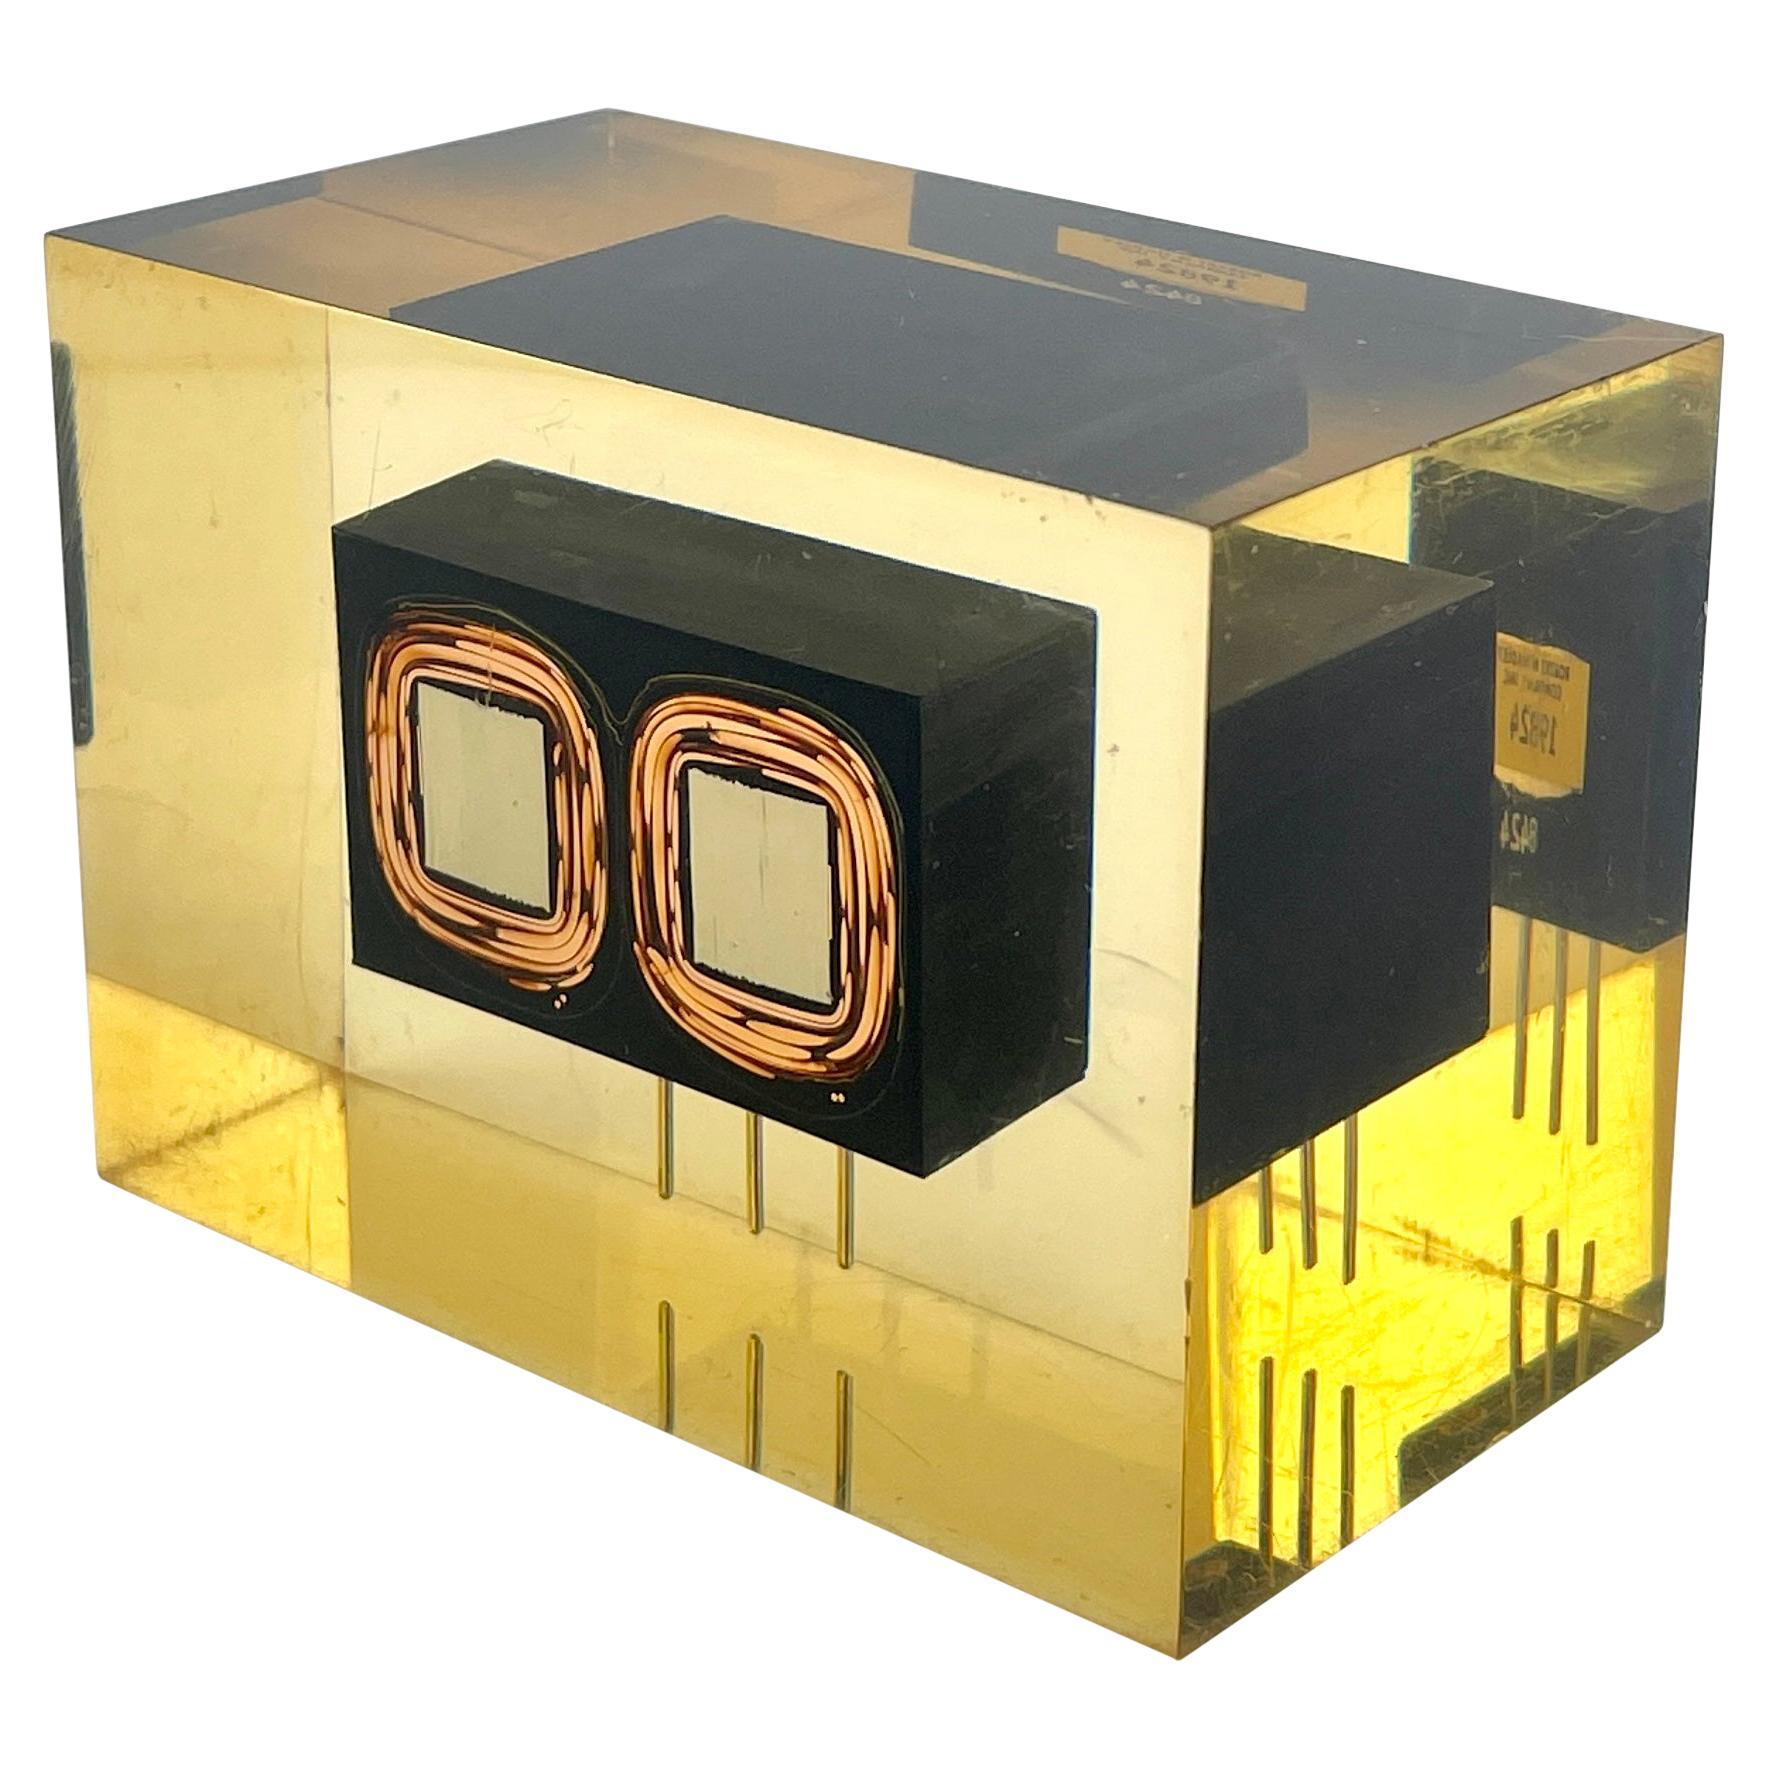 1960s Microchip Lucite Paperweight Vintage Retro Tech Sculpture MCM Anachronism